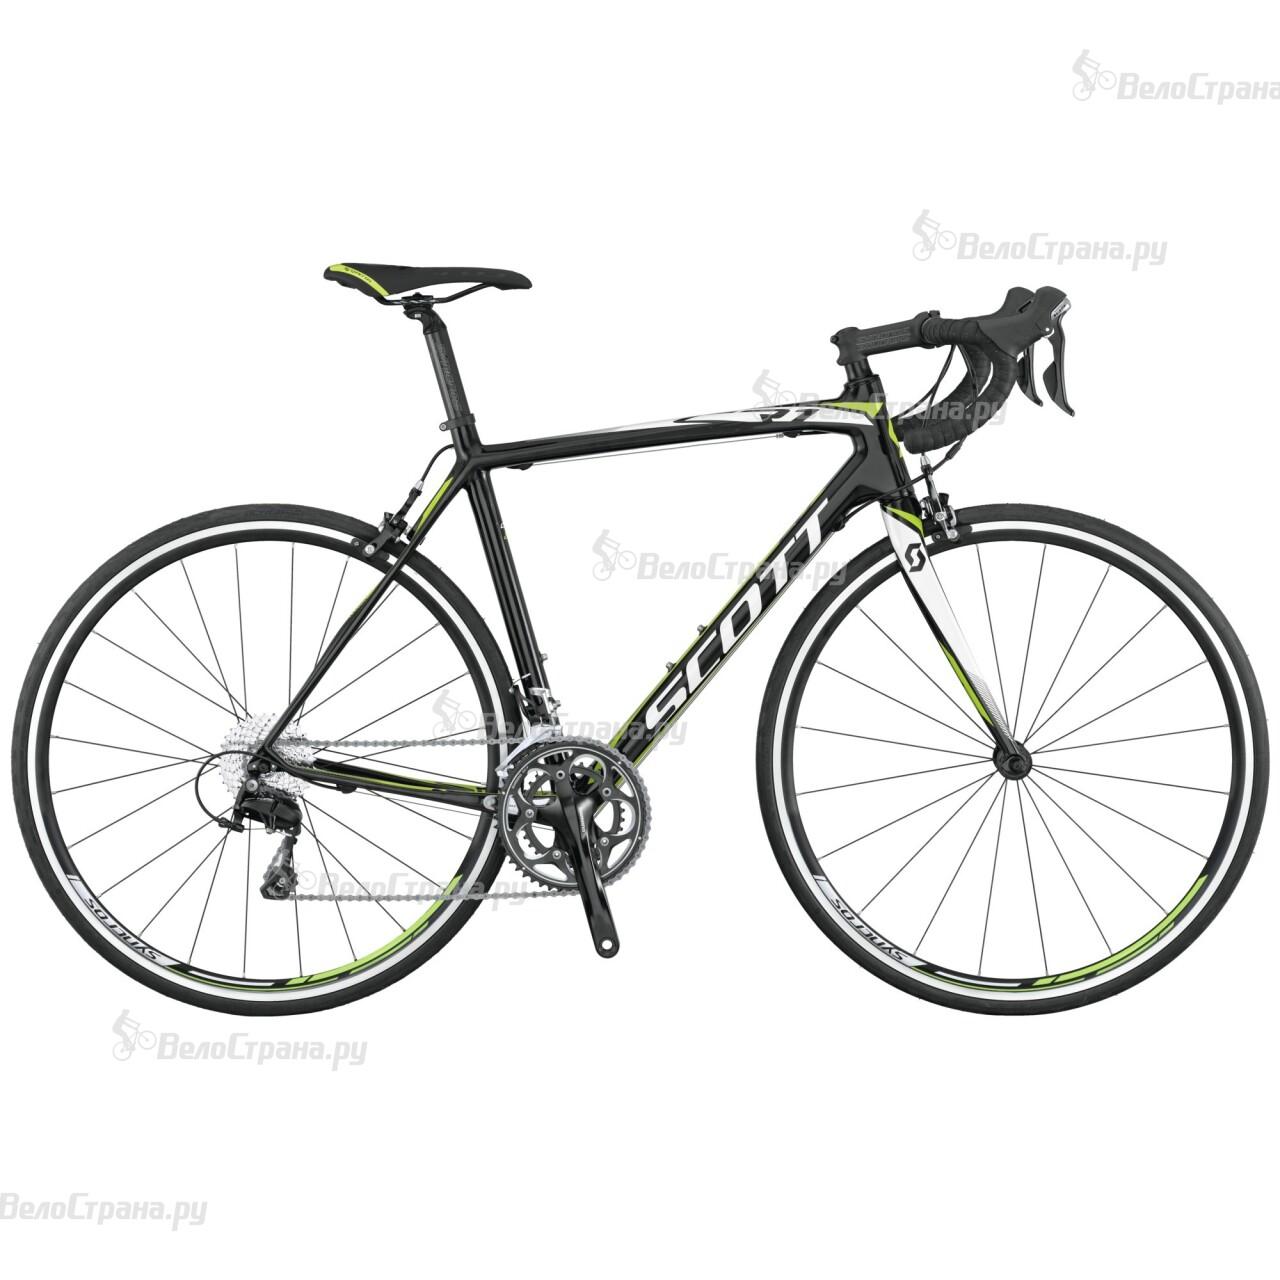 Велосипед Scott CR1 20 (2015) прочие устройства sonance cr1